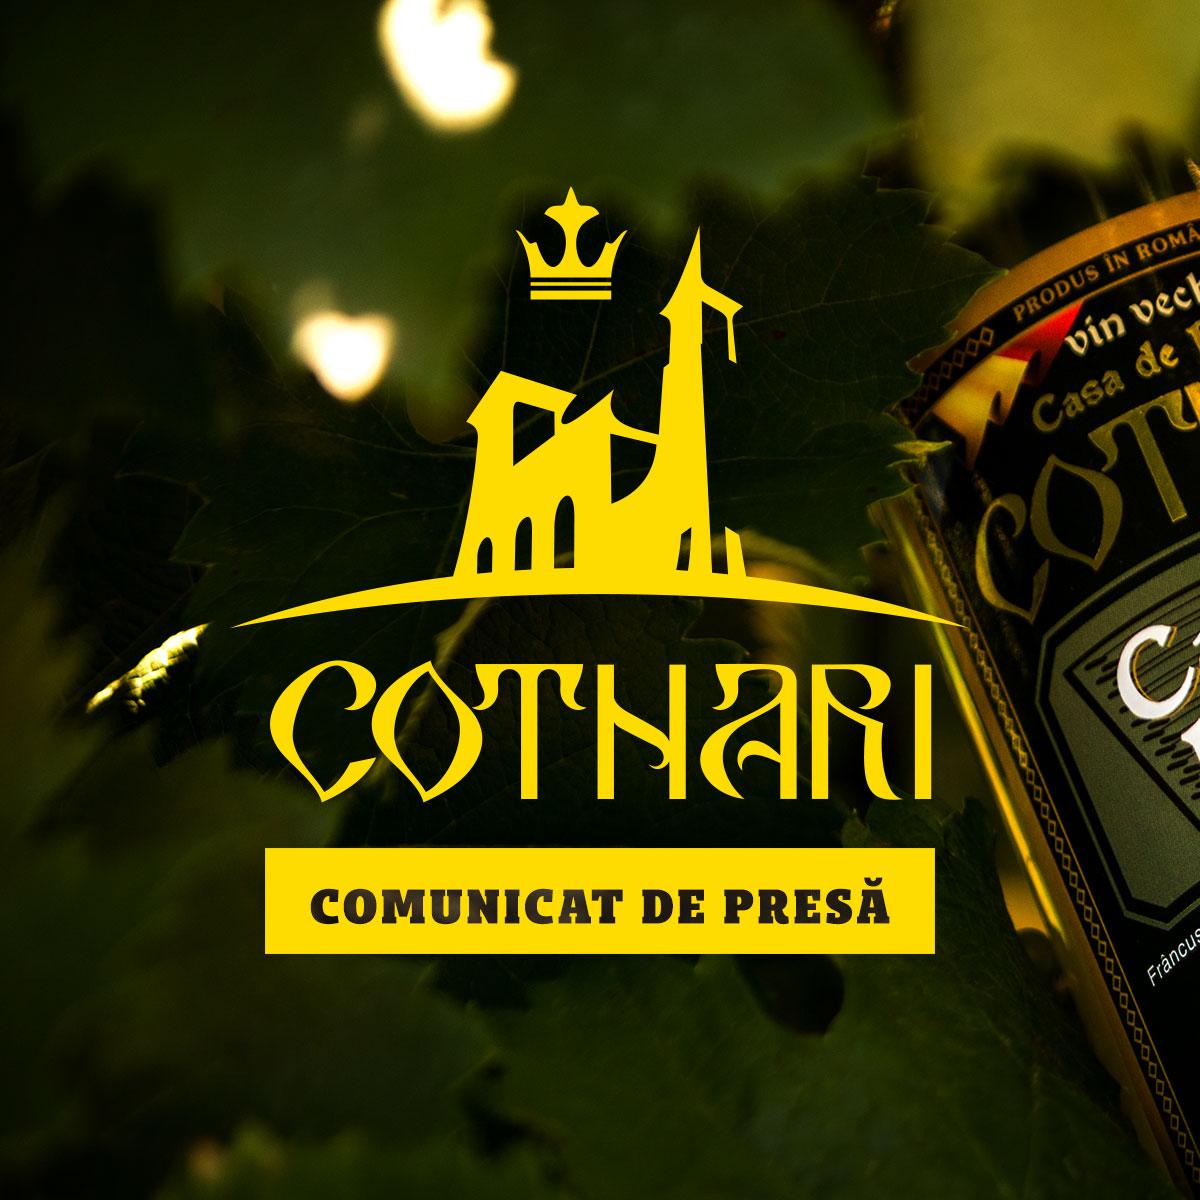 https://www.cotnari.ro/continut/uploads/2017/08/comunicat16.jpg